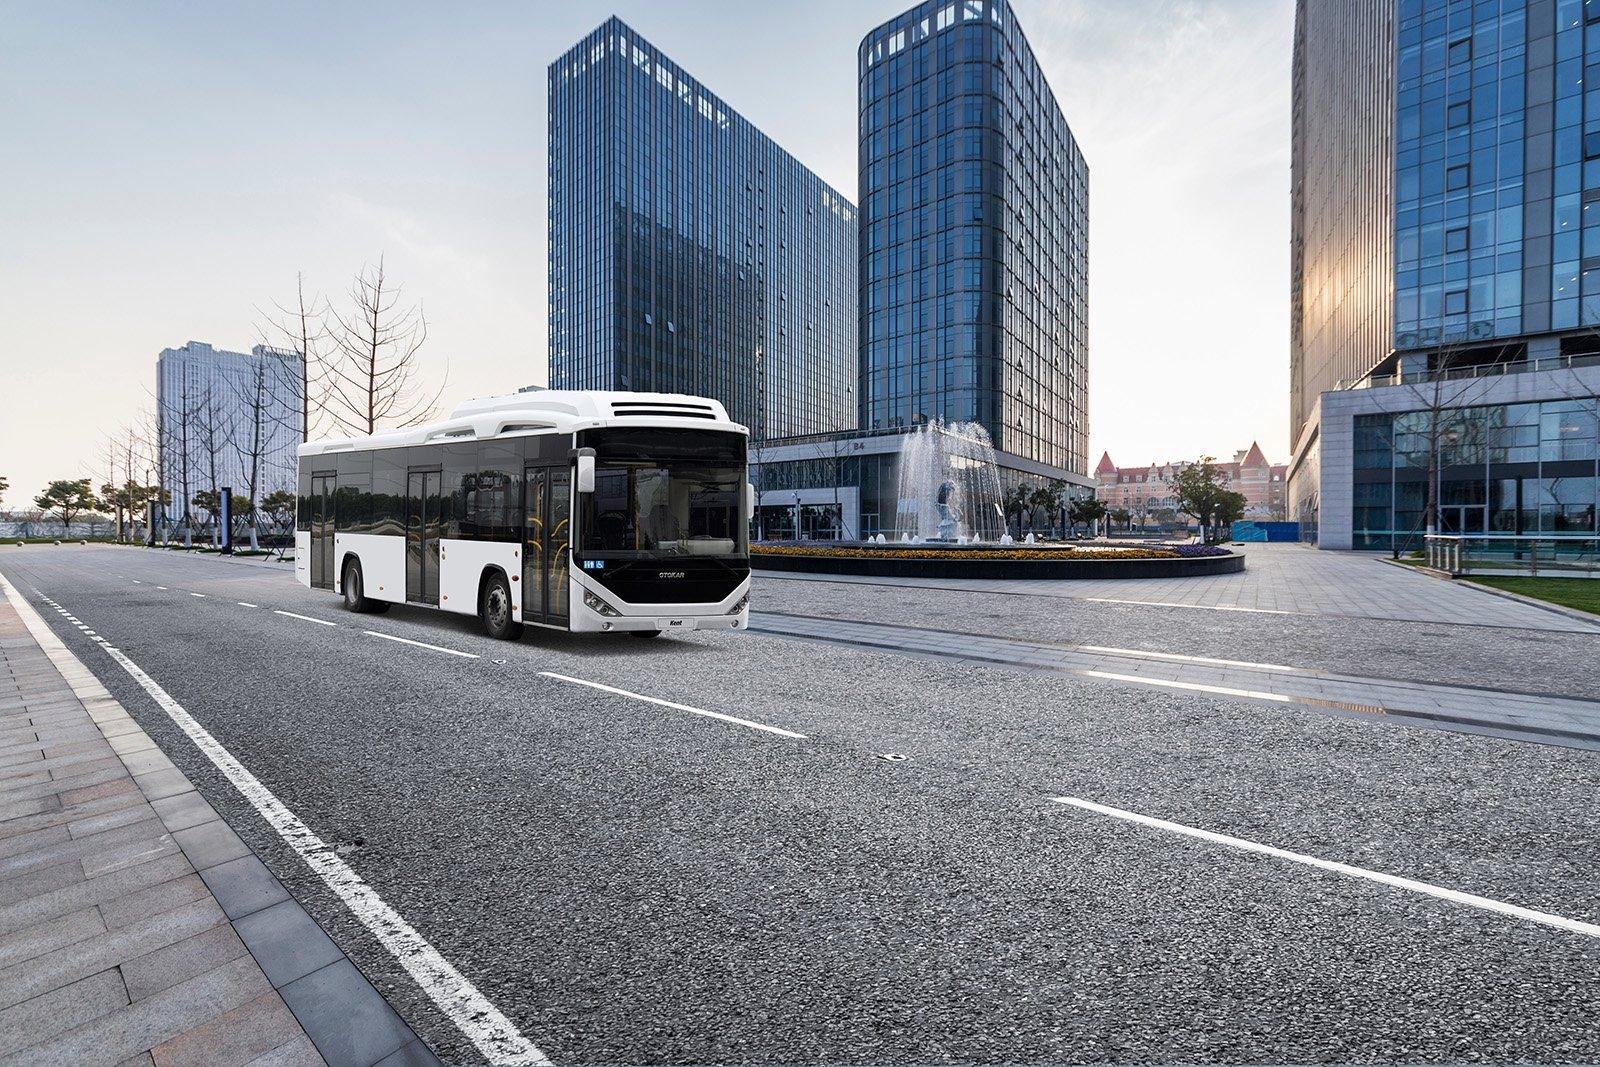 An Otokar-made city bus is seen in this undated file photo. (Courtesy of Otokar)